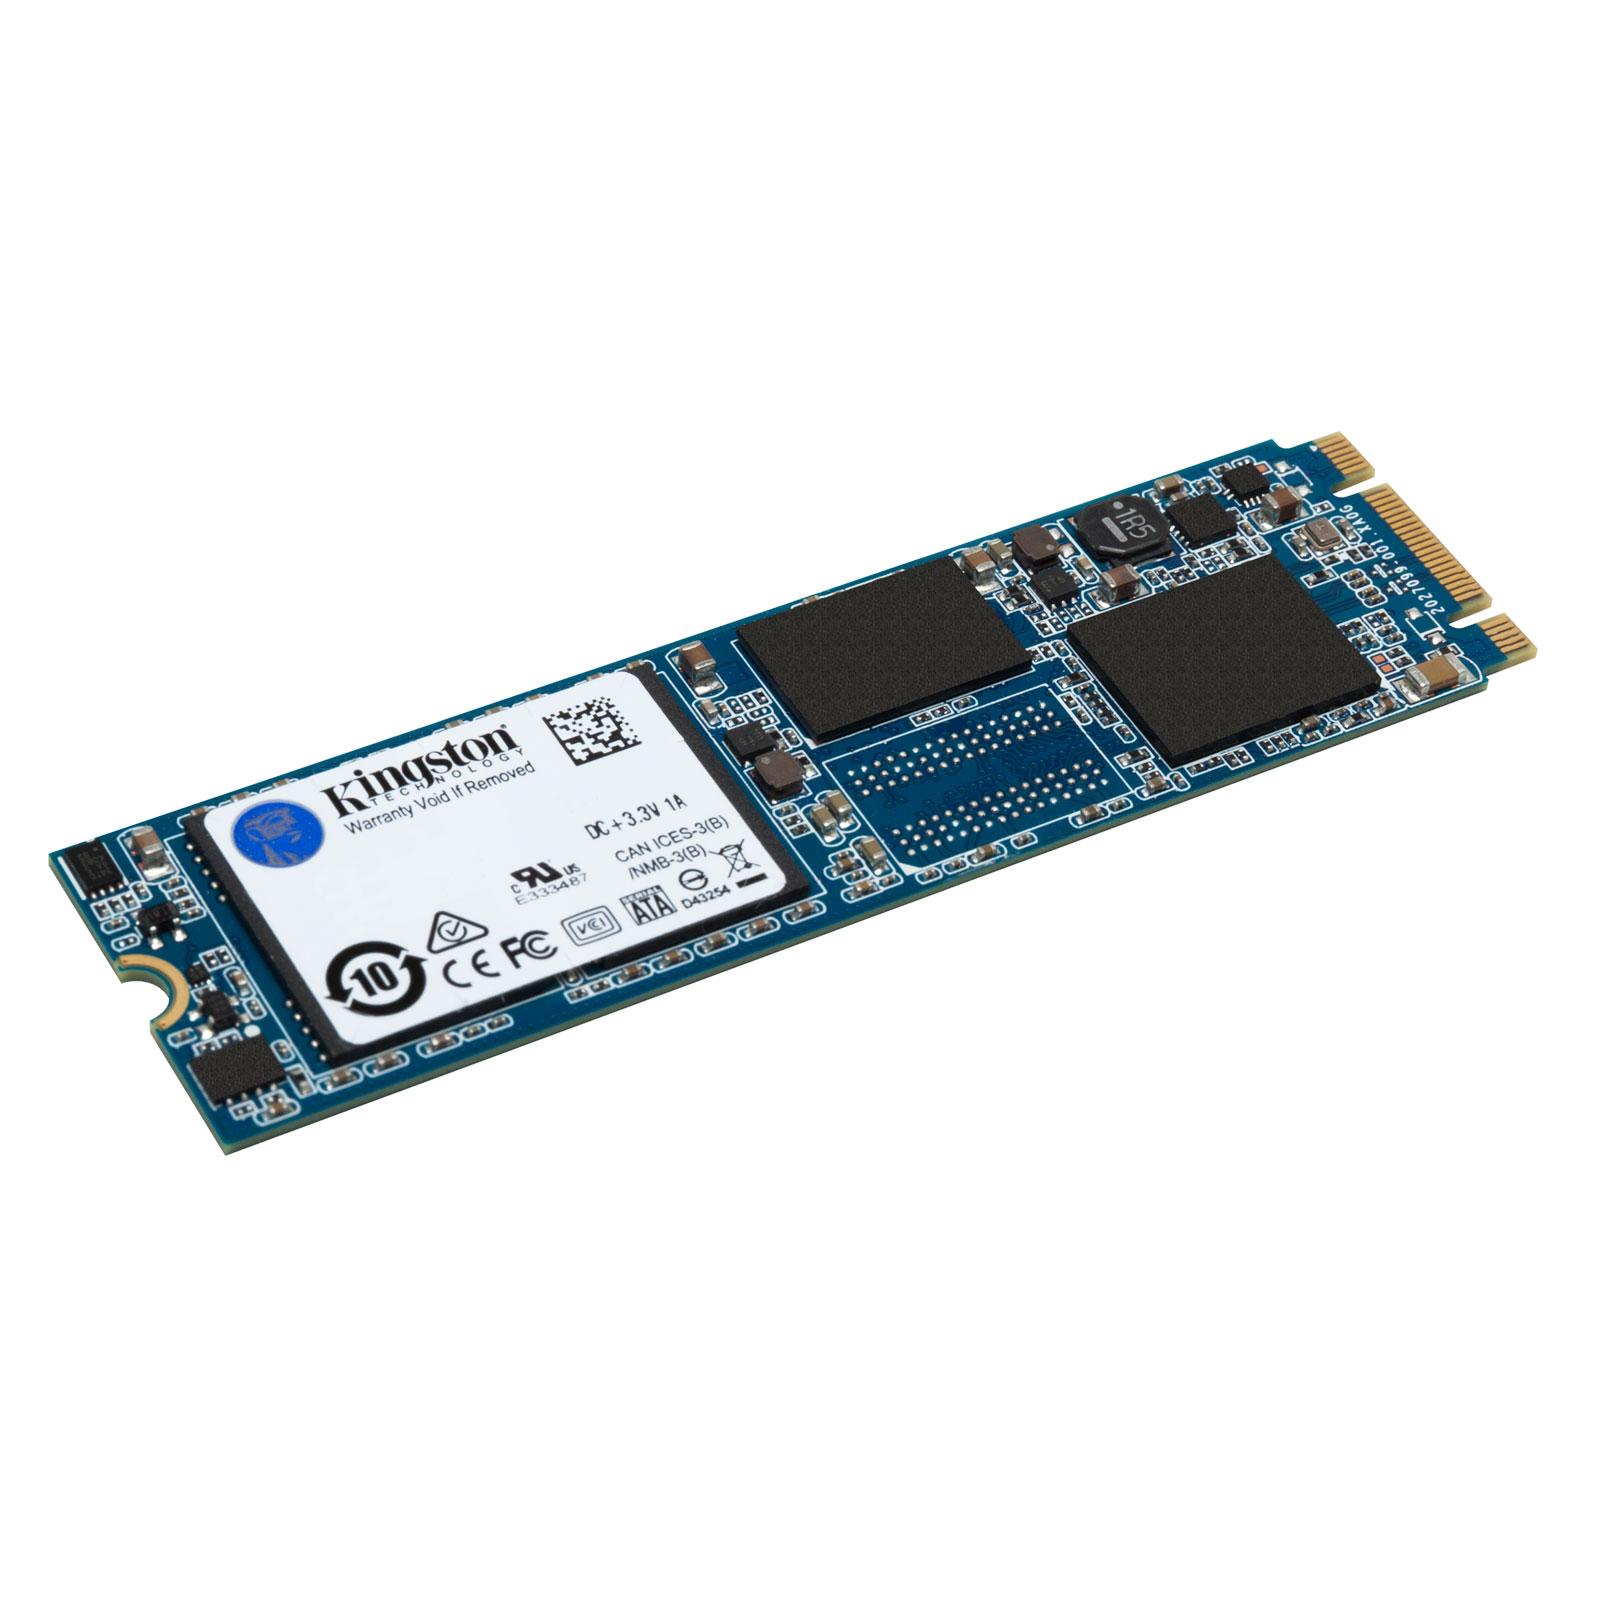 120Go SSD M.2 SUV500M8/120G (SUV500M8/120G) - Achat / Vente Disque SSD sur Picata.fr - 0